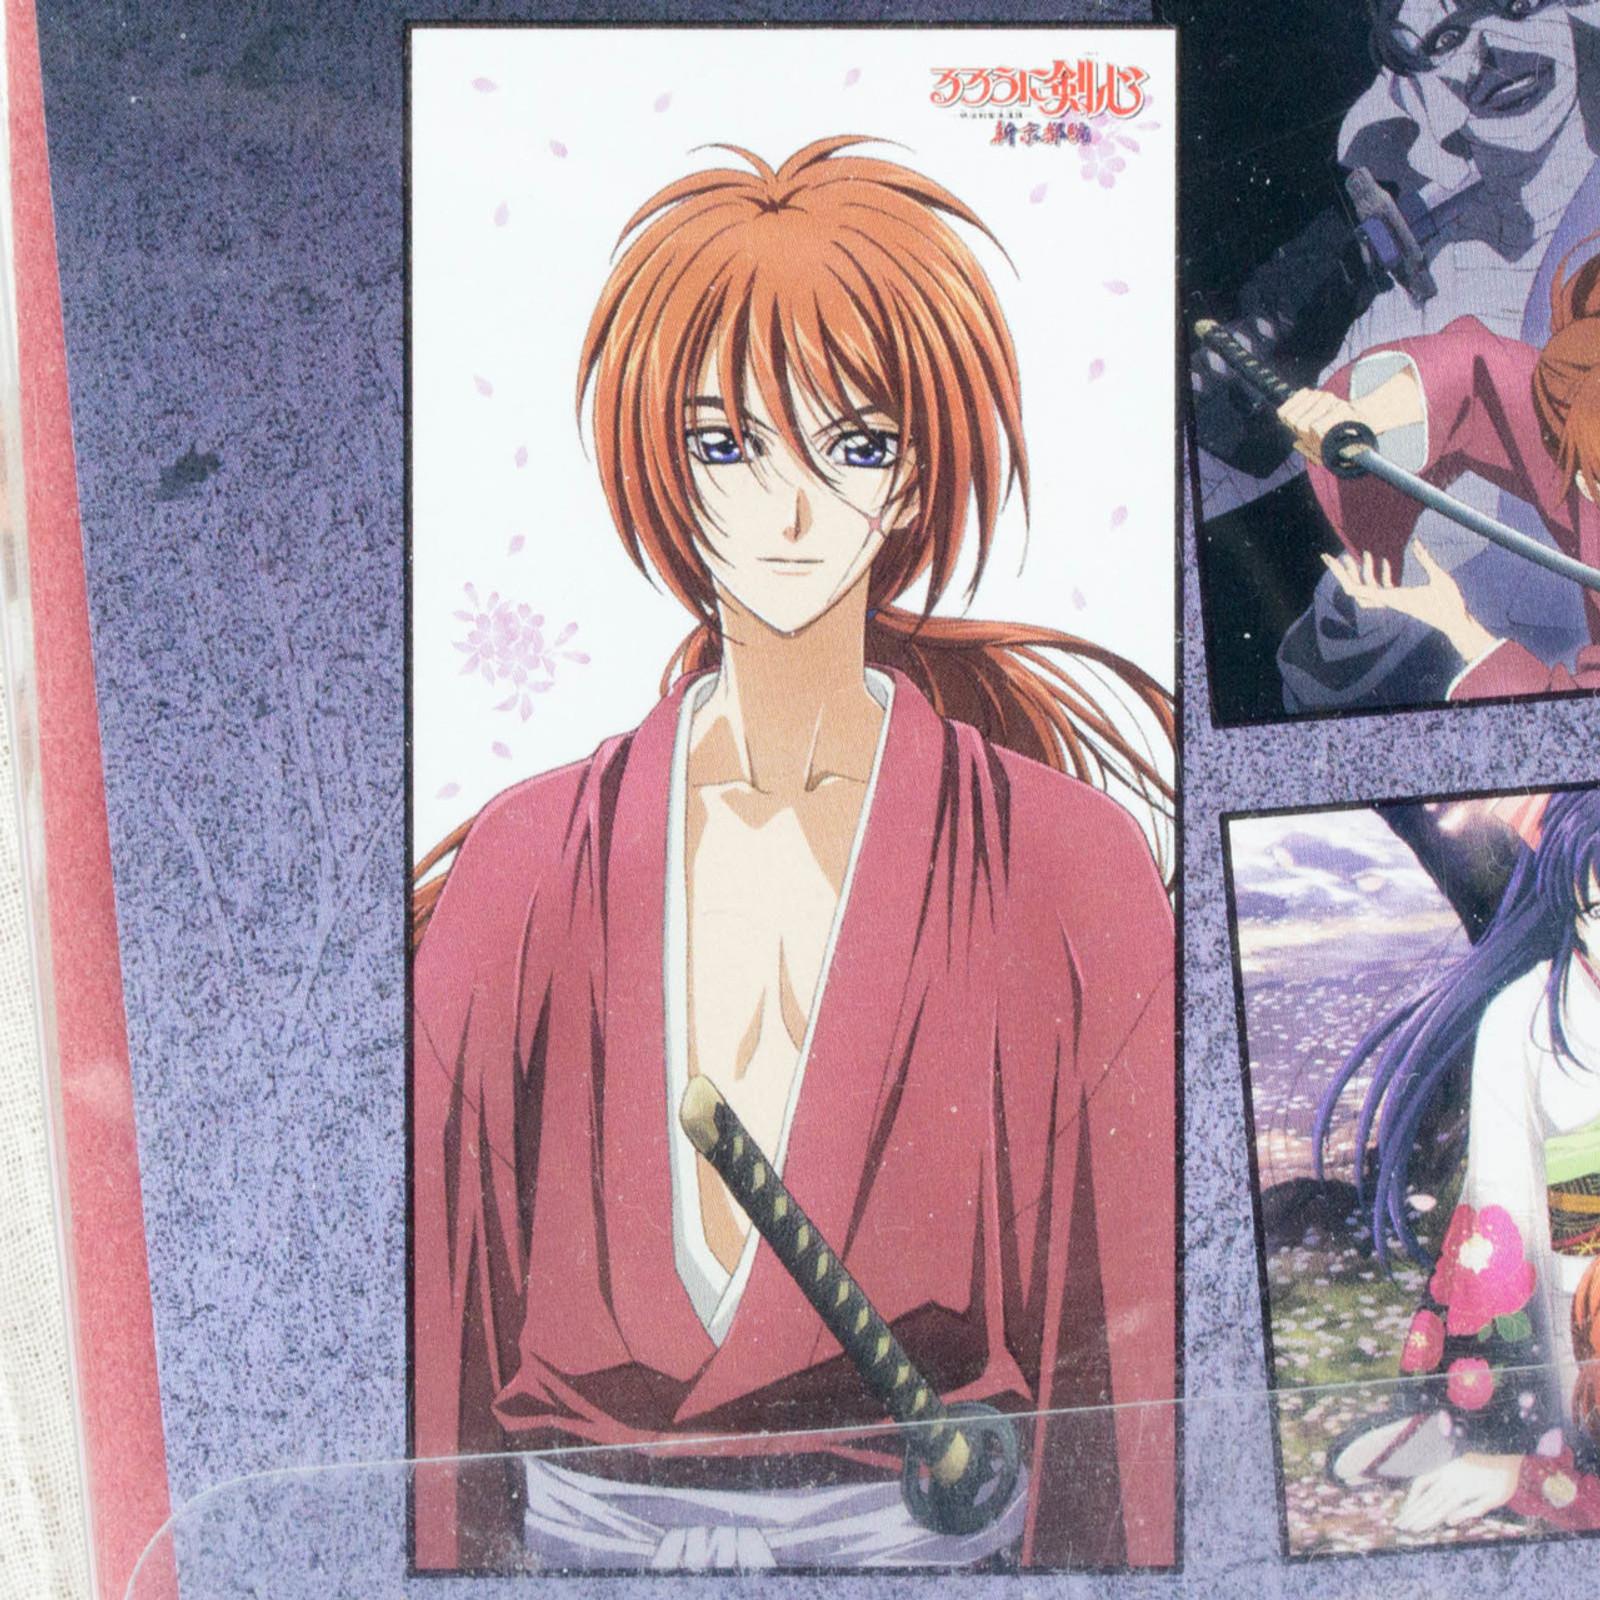 Rurouni Kenshin Kenshin Himura Microfiber Towel 75cm x 30cm JAPAN ANIME MANGA